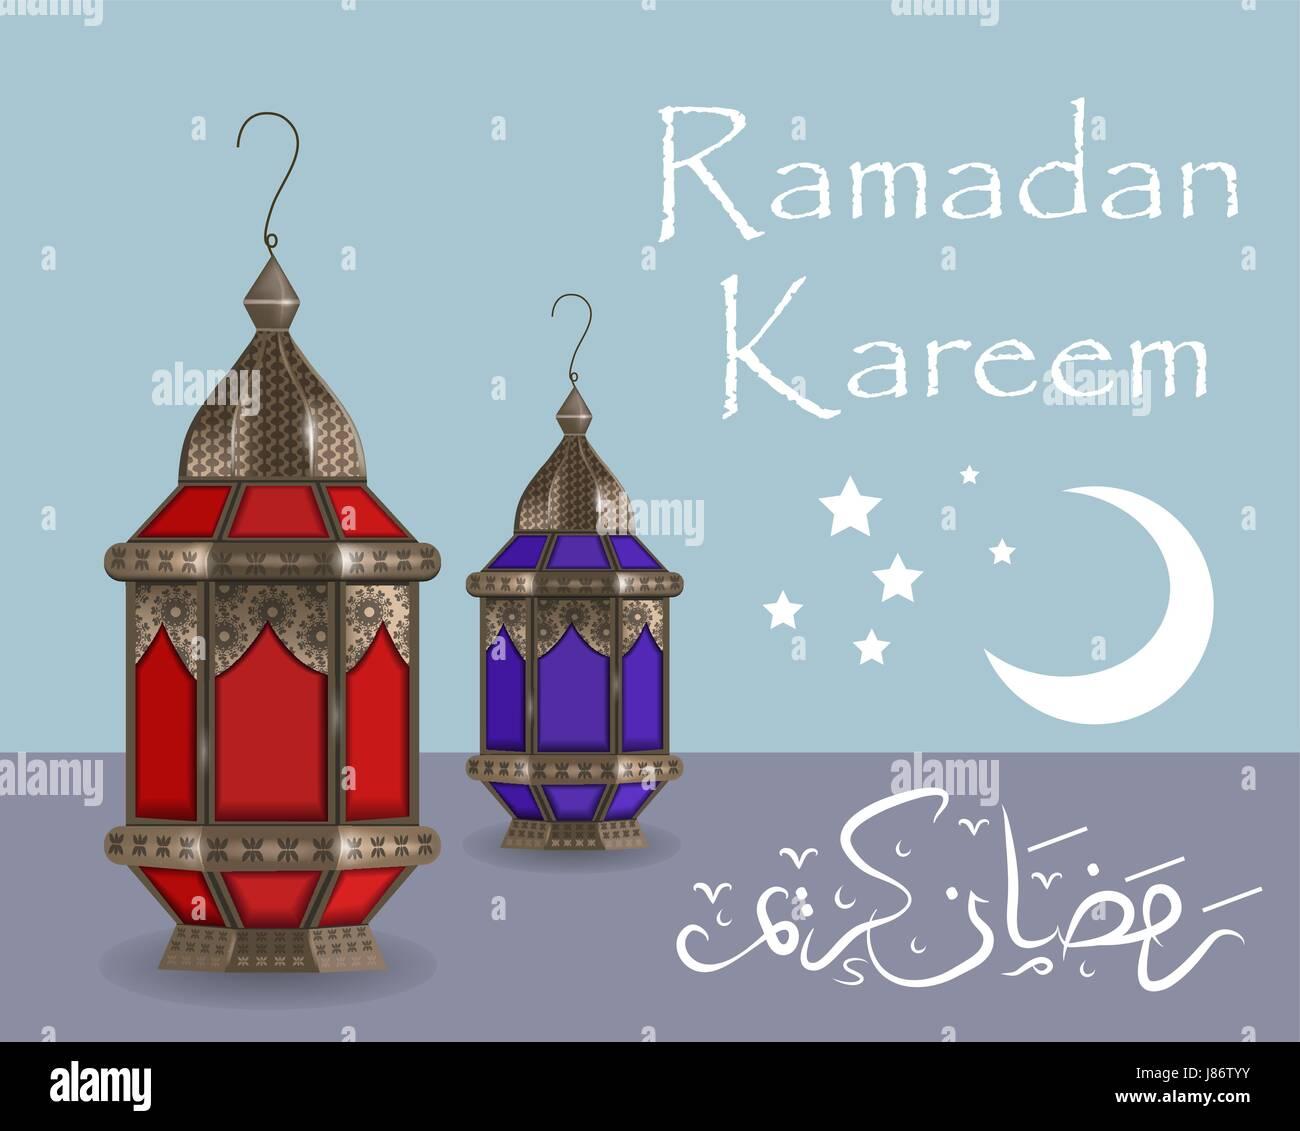 Ramadan kareem greeting card with lanterns template for invitation ramadan kareem greeting card with lanterns template for invitation flyer muslim religious holiday vector illustration stopboris Images